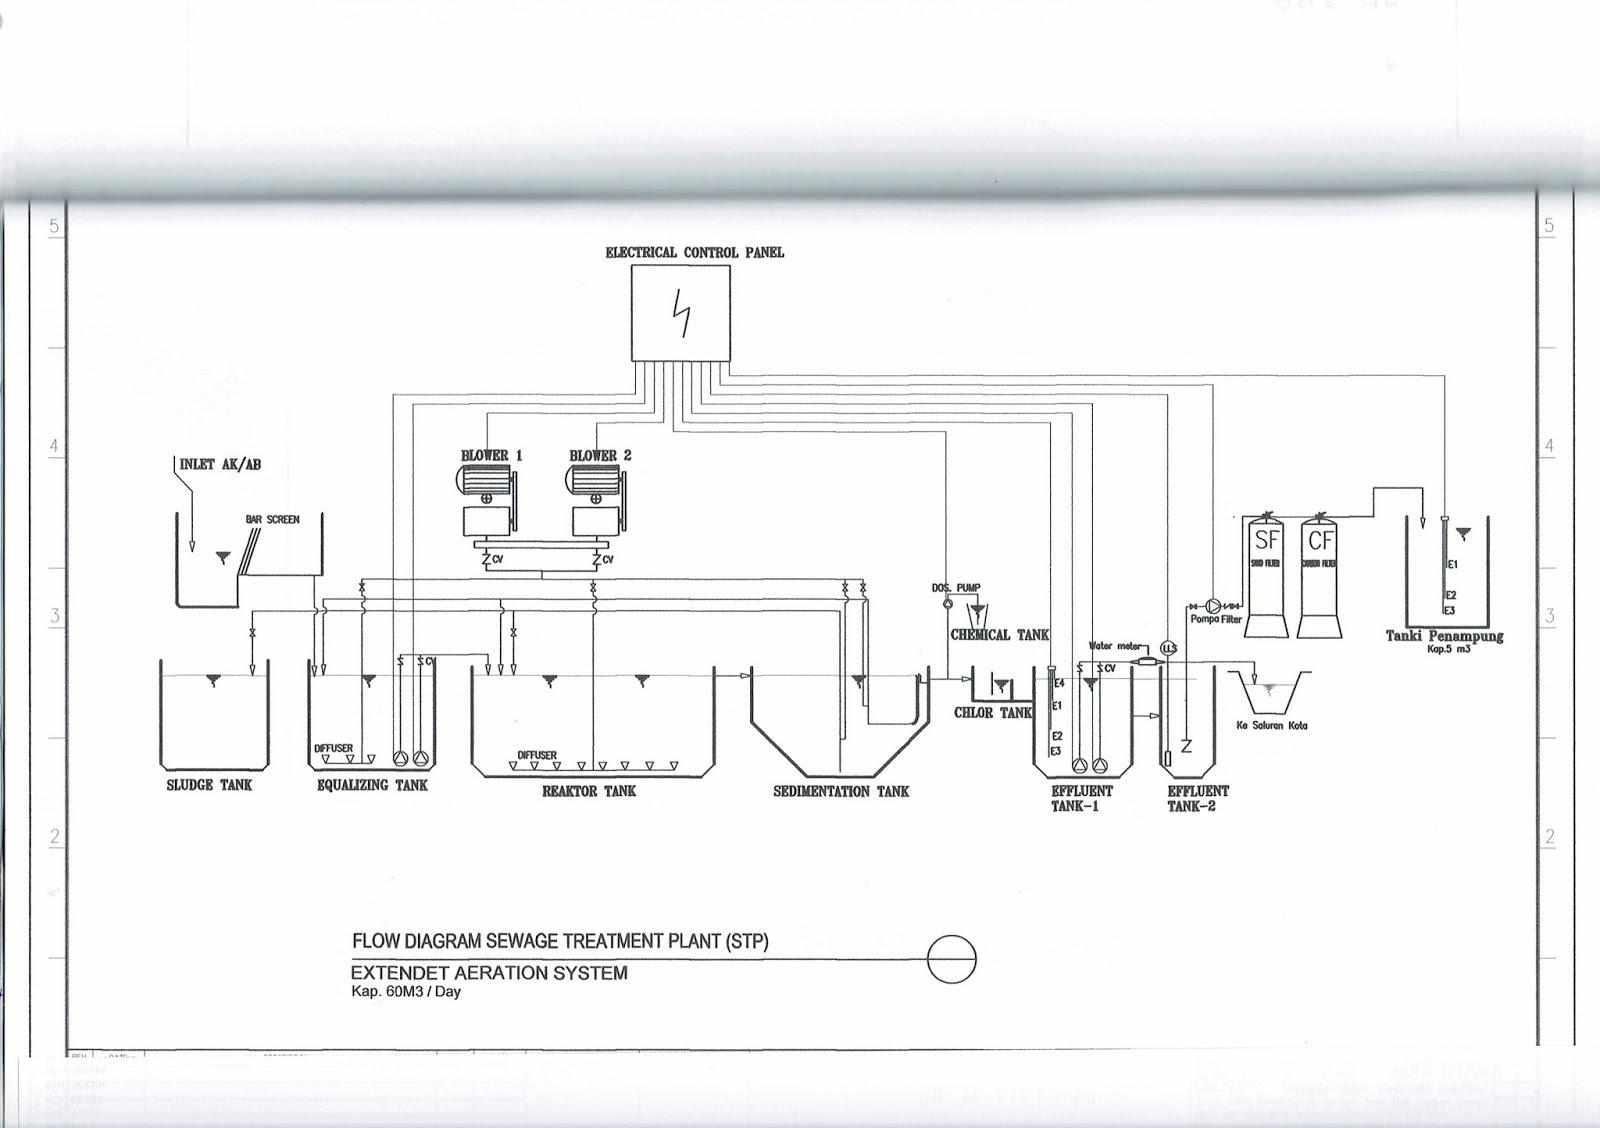 Mengenal Sewage Treatment Plant Stp Sewage Treatment